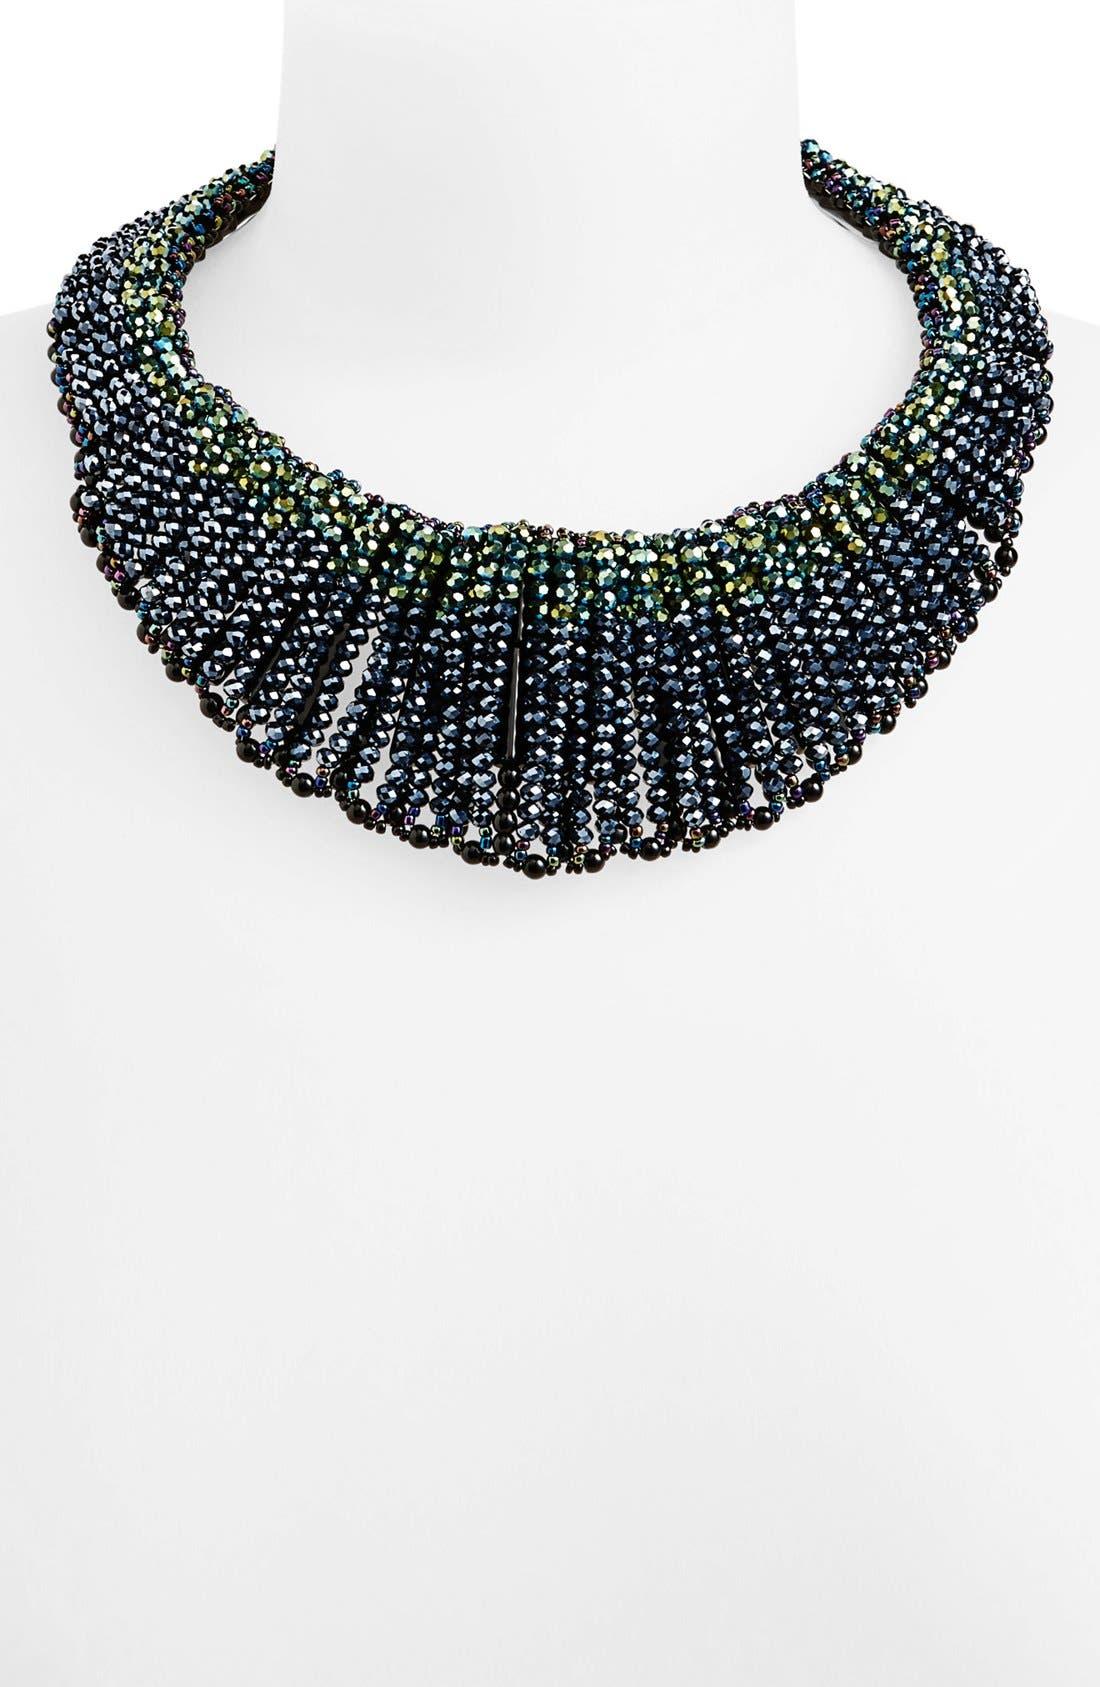 Alternate Image 1 Selected - Nakamol Design Multistrand Collar Necklace